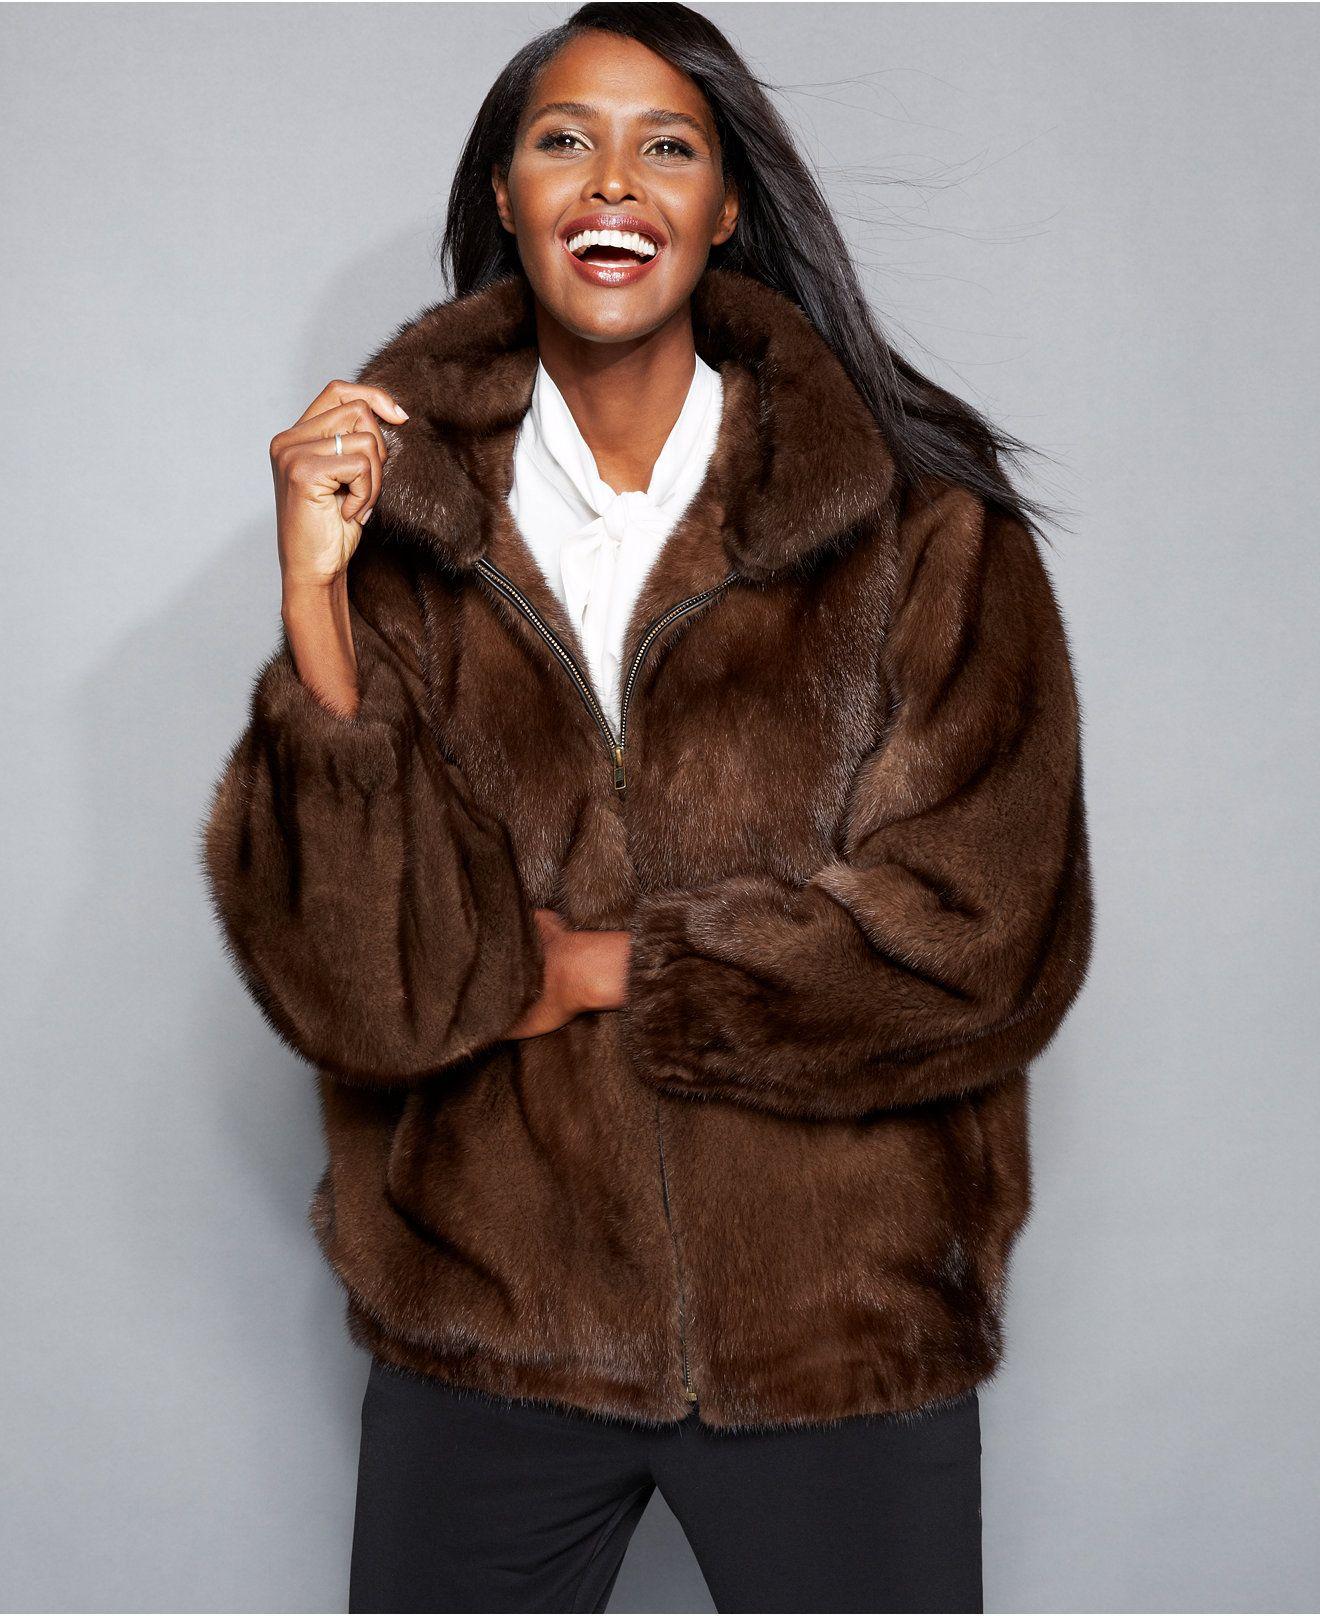 sheared mink bomber jacket for women - Google Search | Lizzi ...